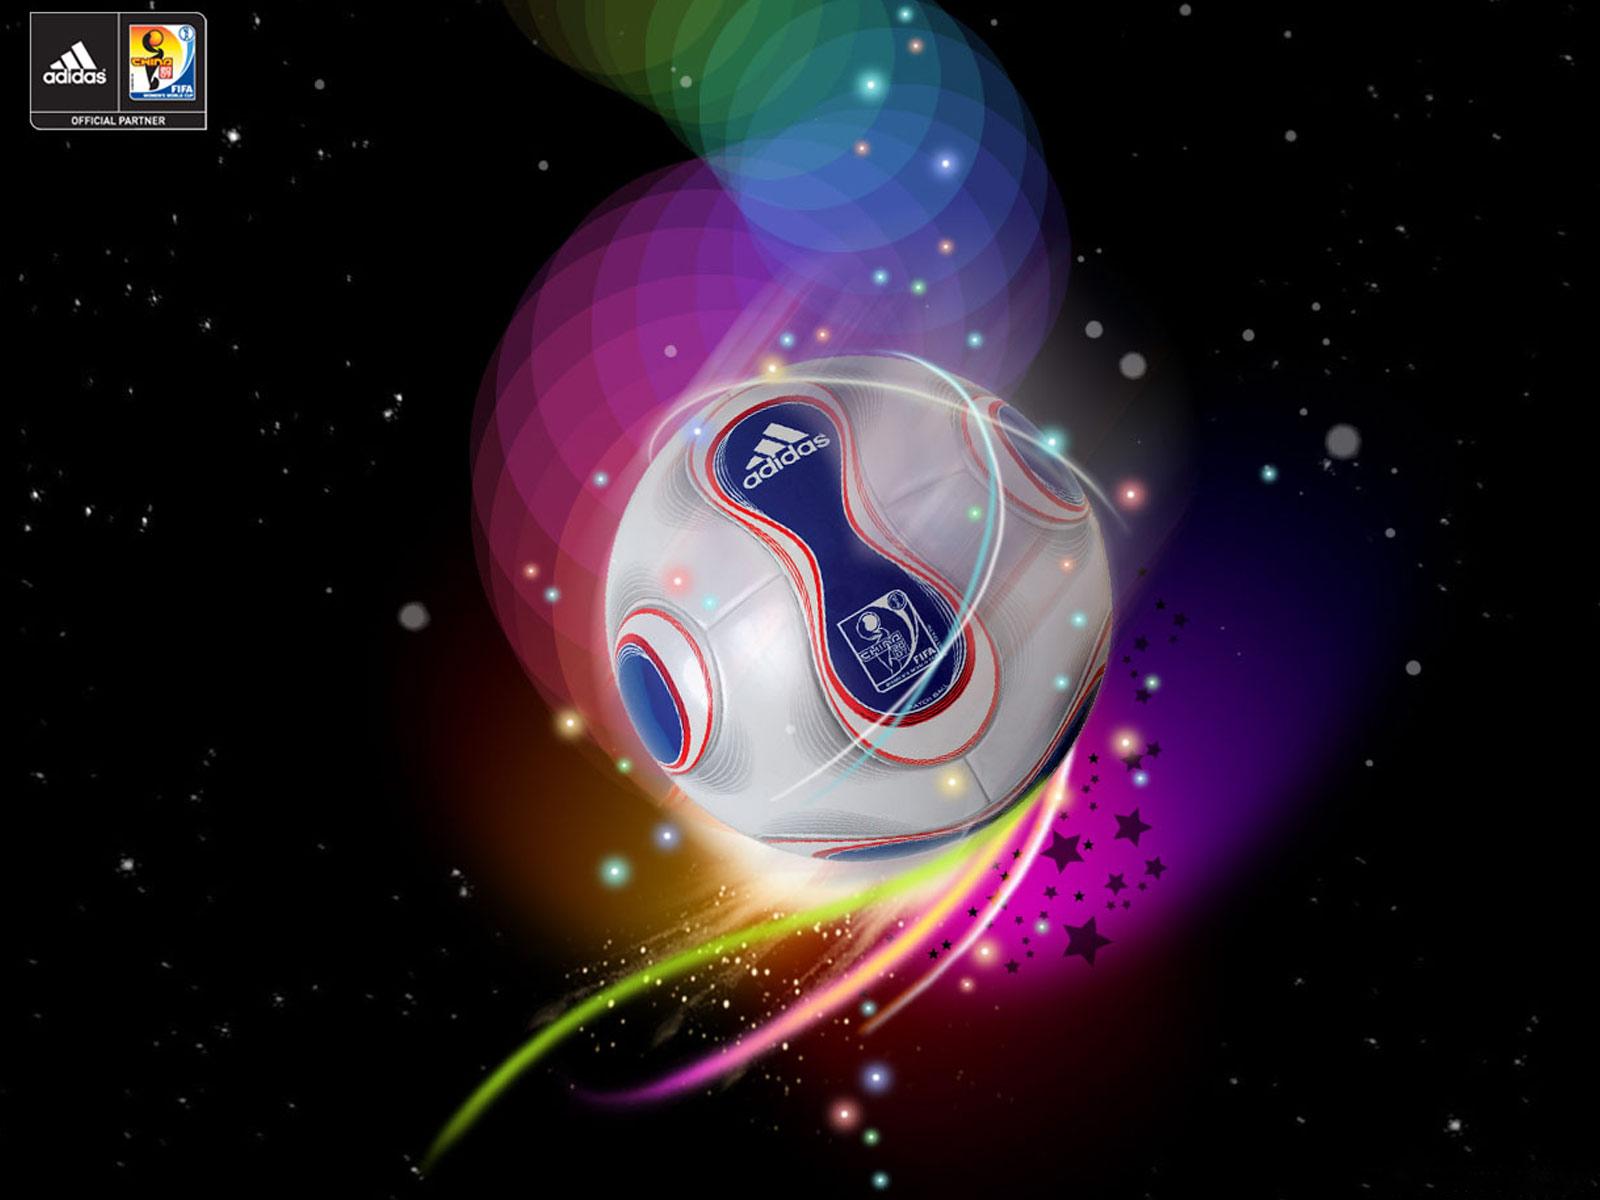 soccer wallpapers soccer wallpapers soccer wallpapers soccer 1600x1200